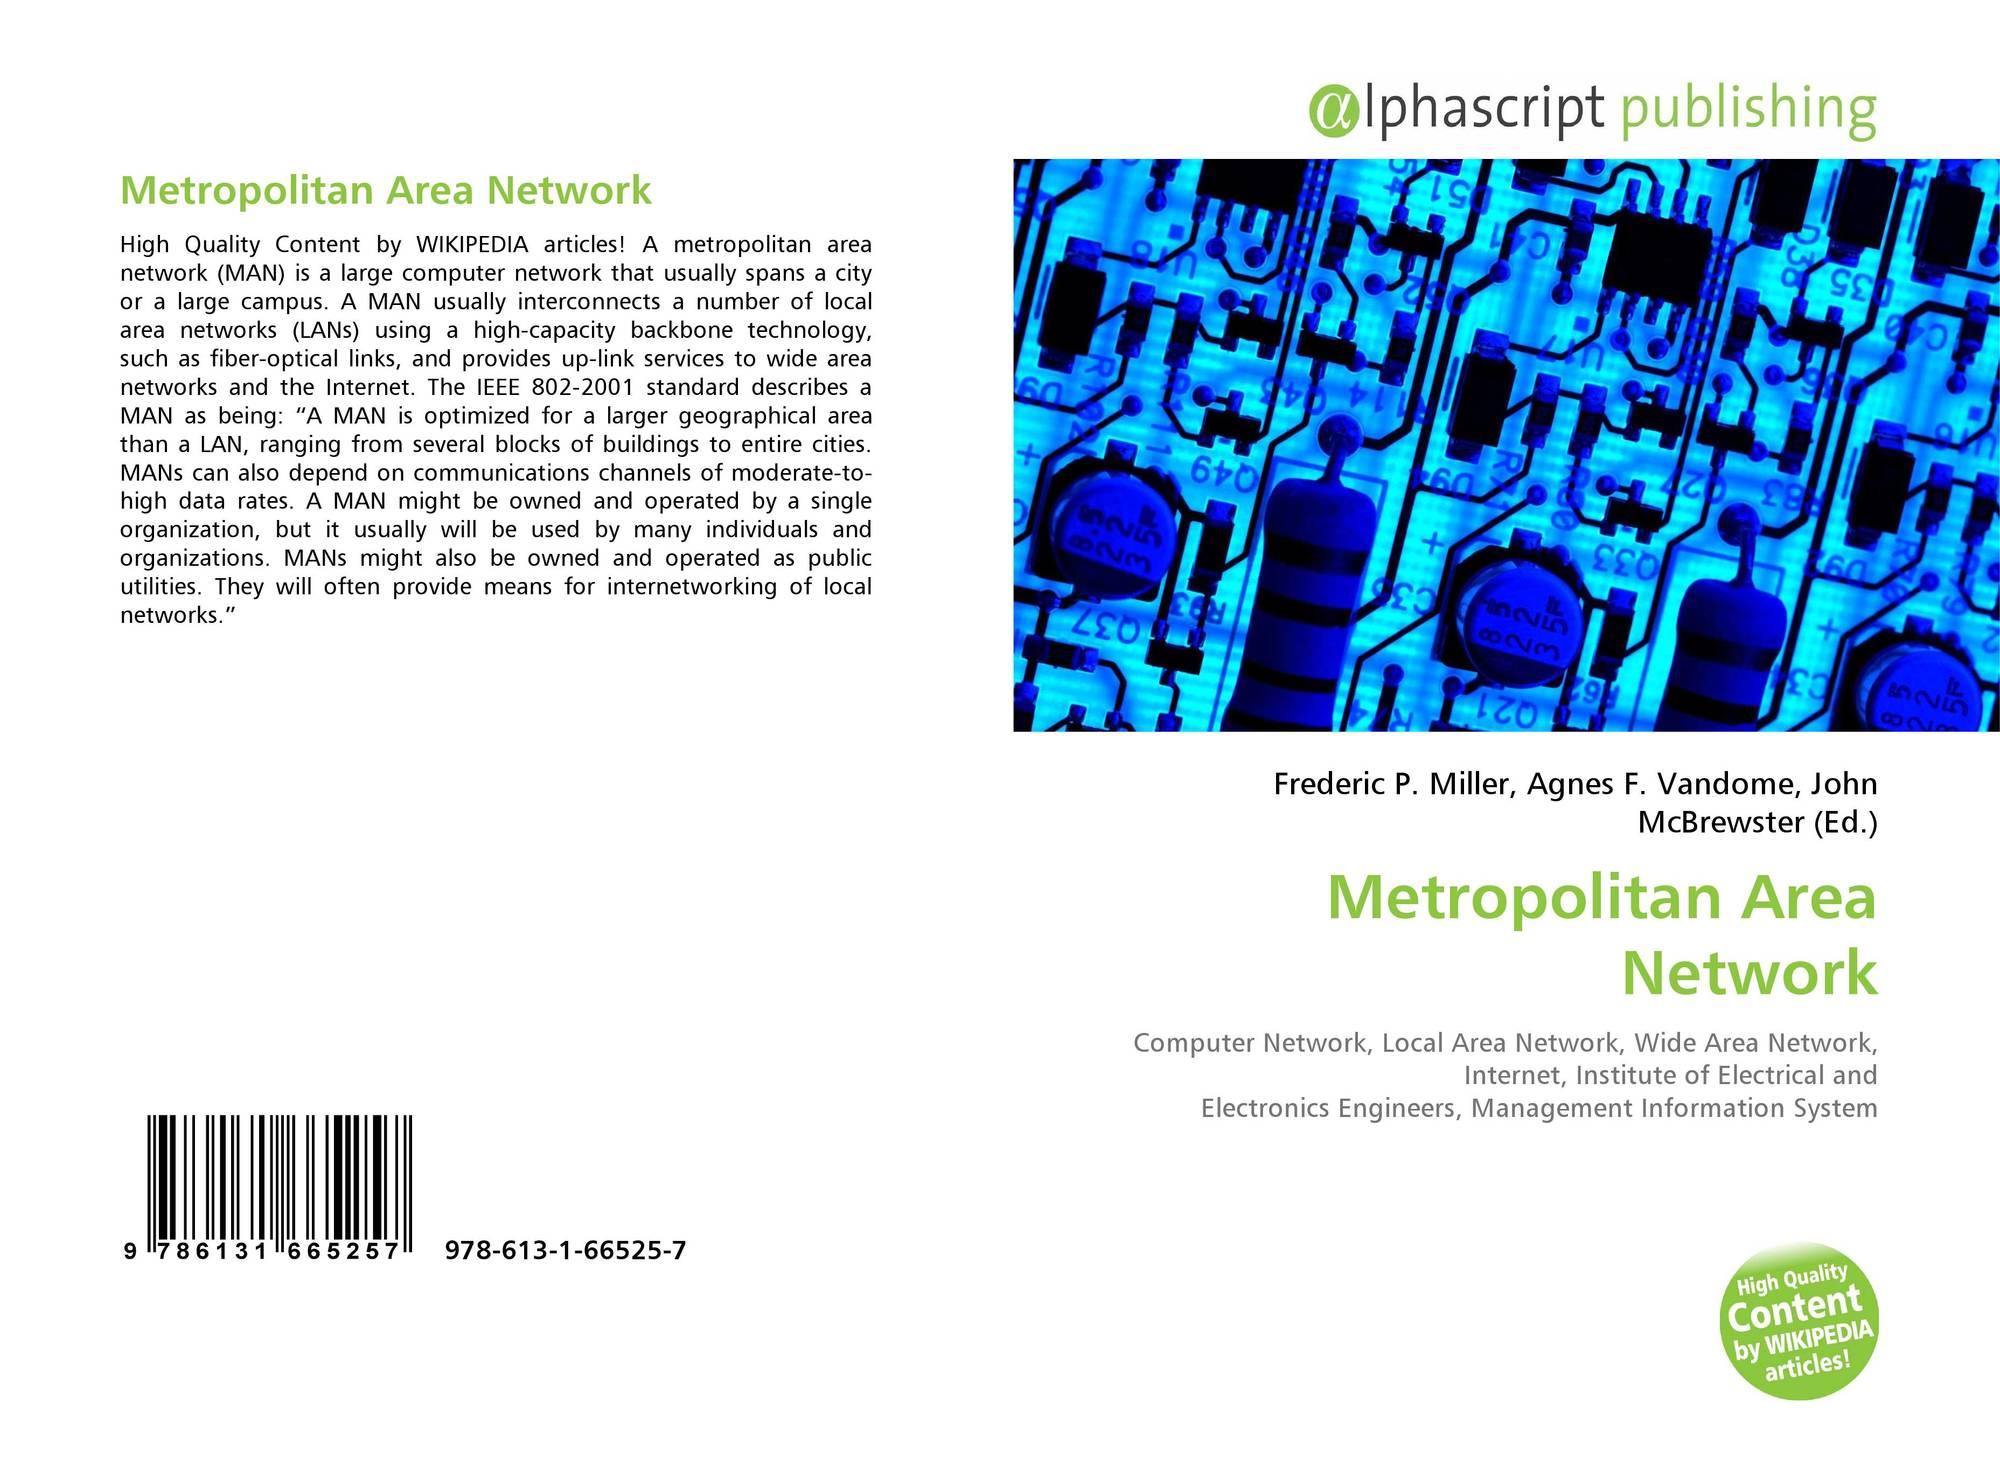 Metropolitan Area Network, 978-613-1-66525-7, 6131665257